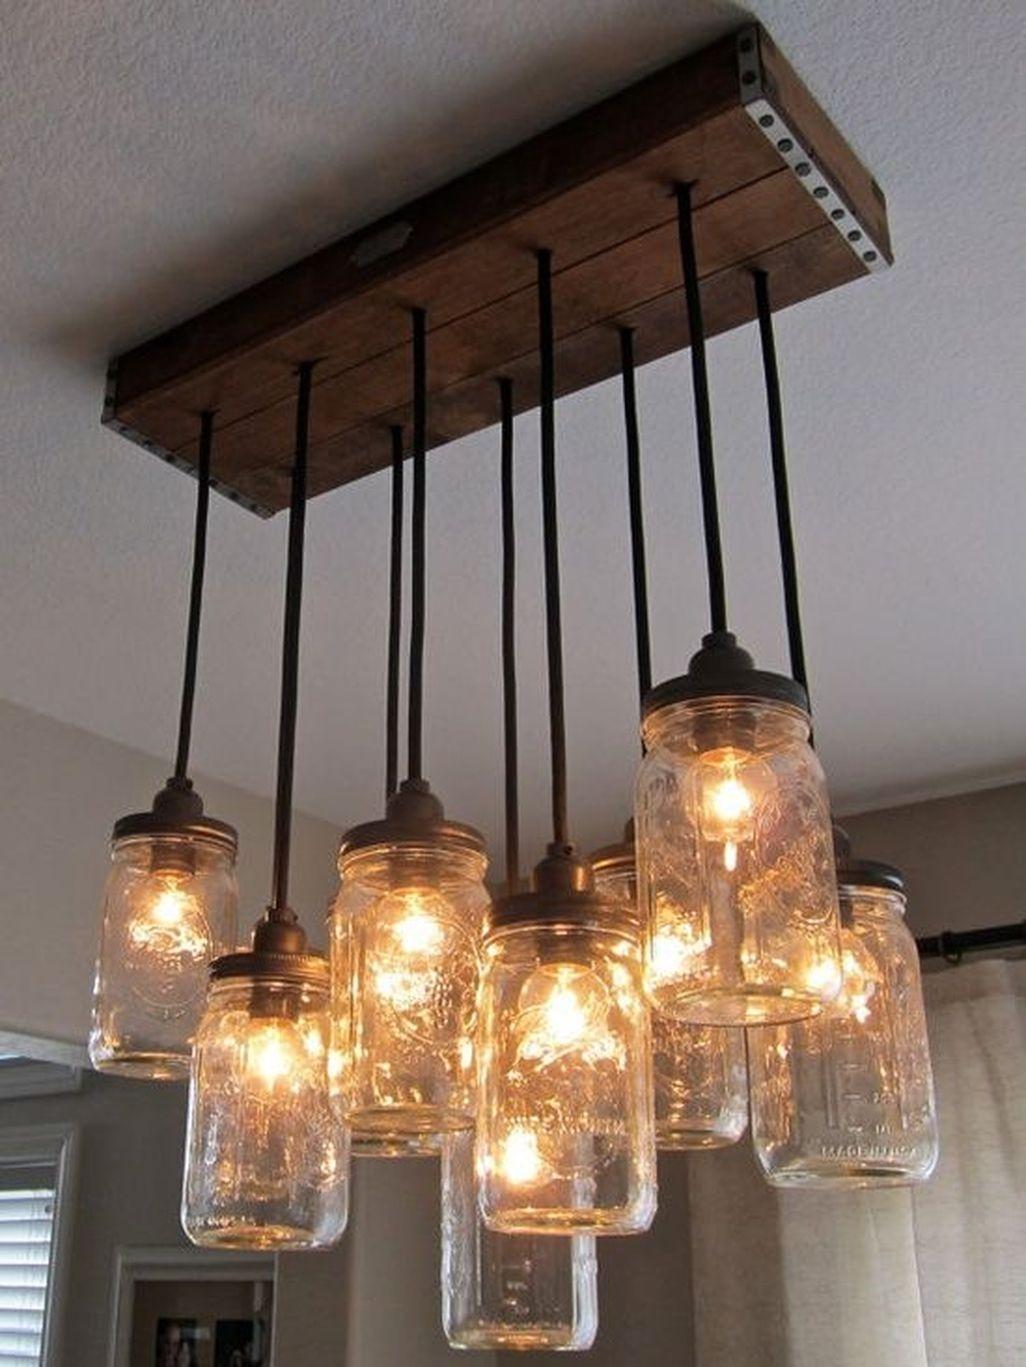 Farmhouse Home Decor Ideas 12